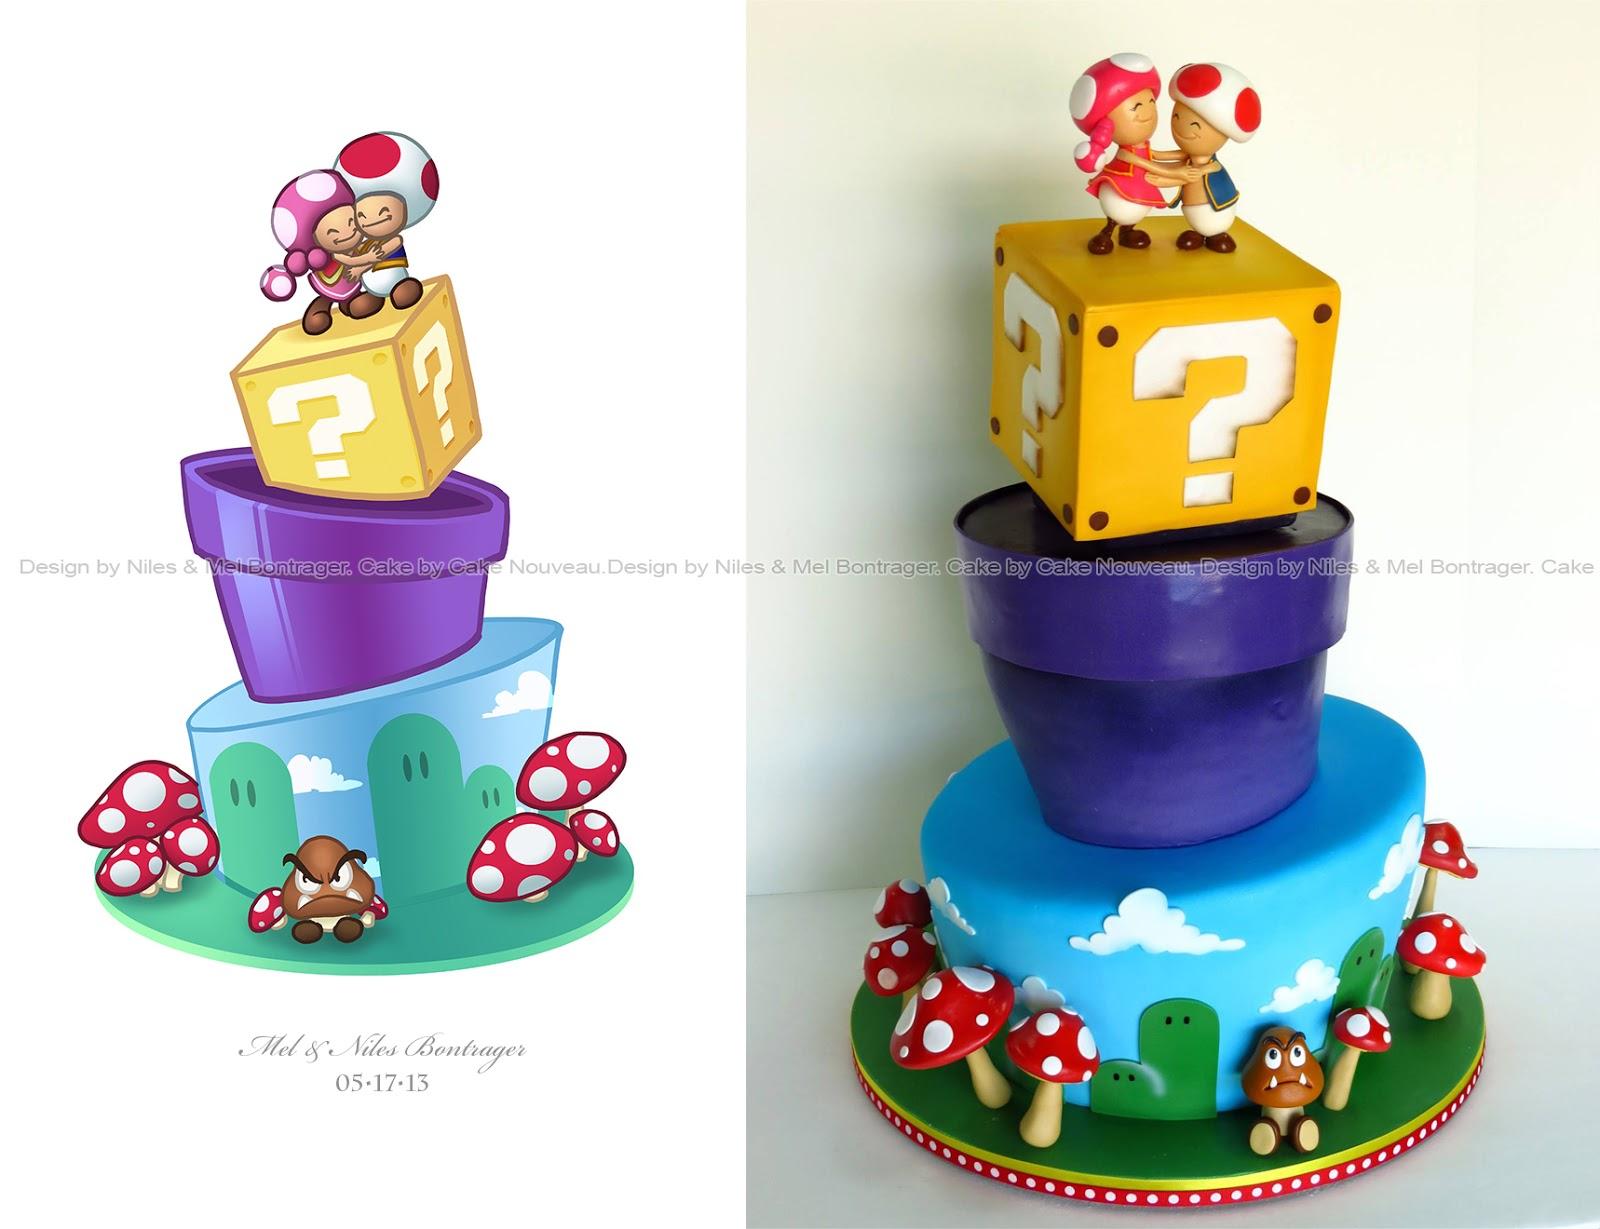 Mario Kart Wedding Cake Ideas And Designs